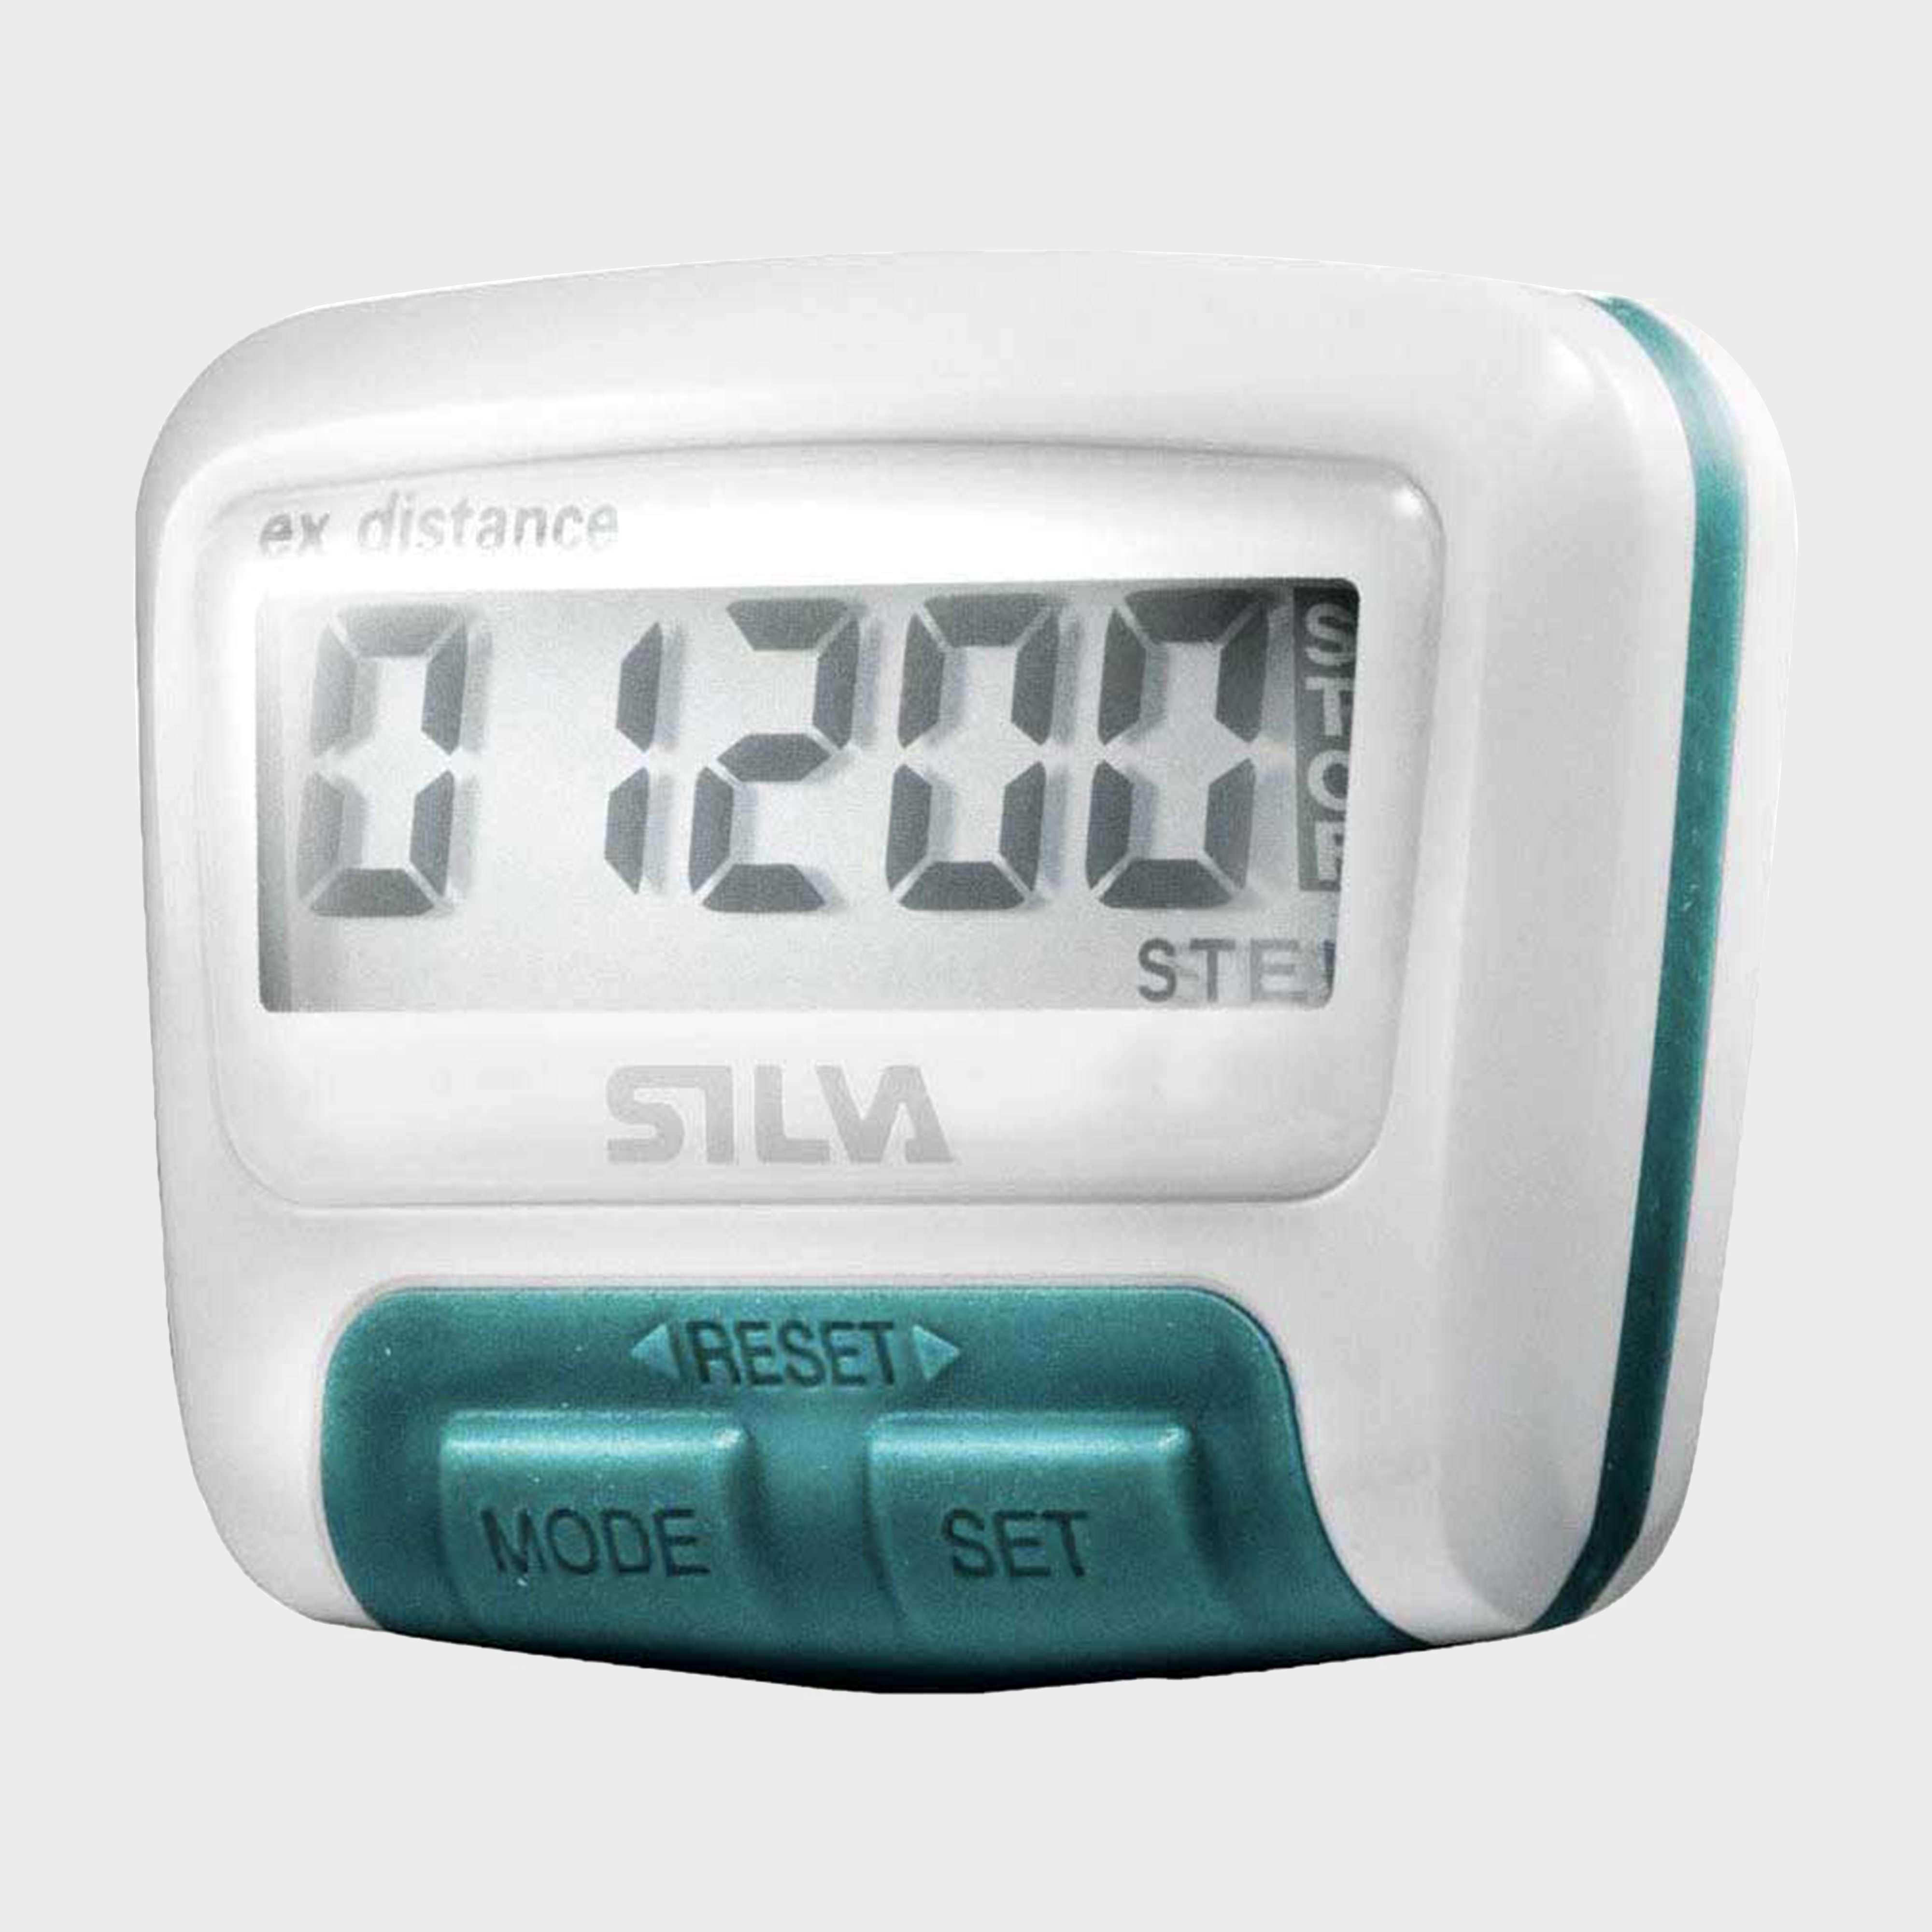 SILVA Ex Distance Pedometer